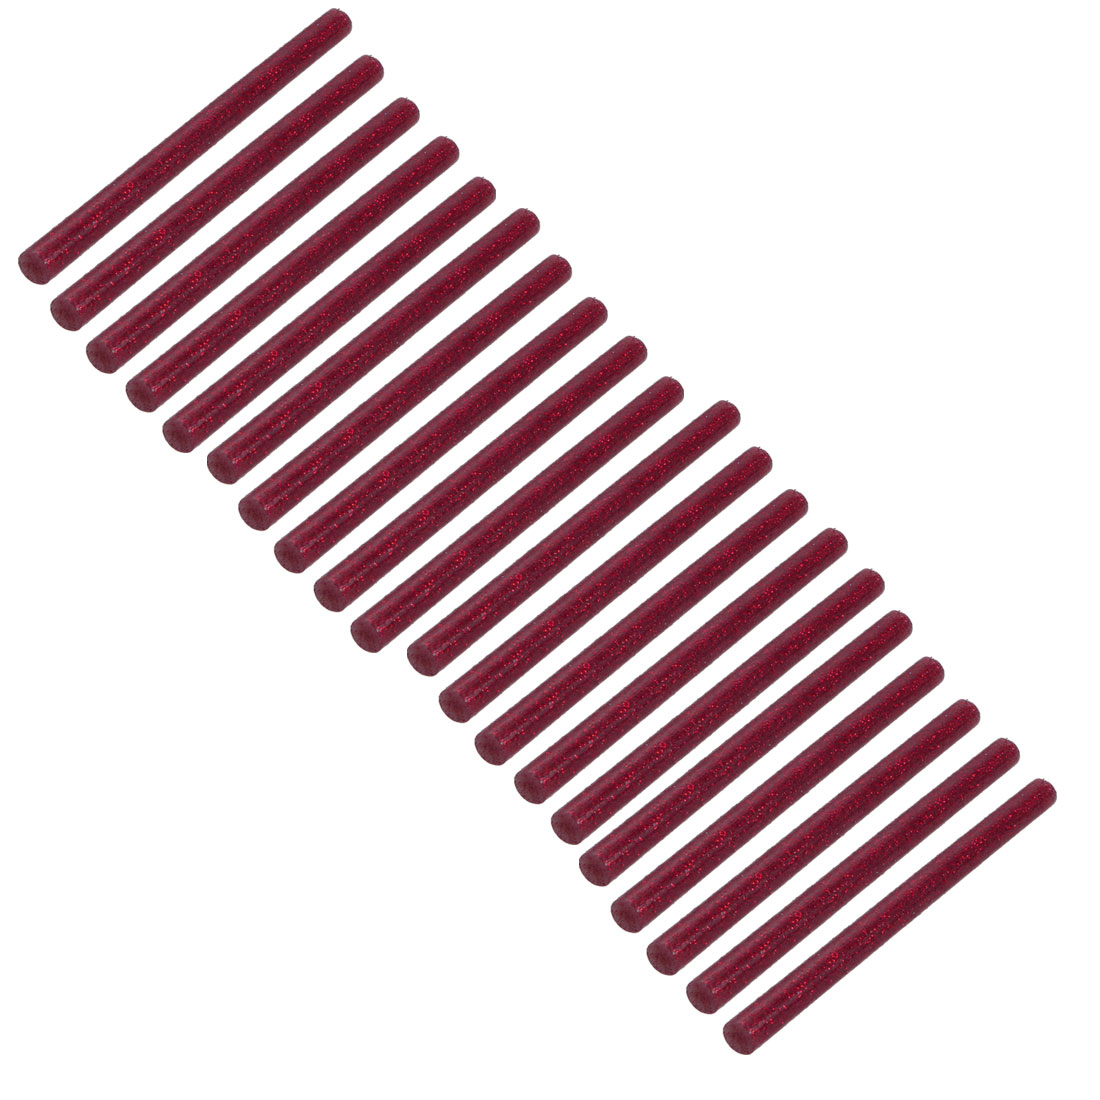 20pcs 7mm Dia 100mm Long Hot Melt Glue Adhesive Stick Shinning Red - image 3 de 3